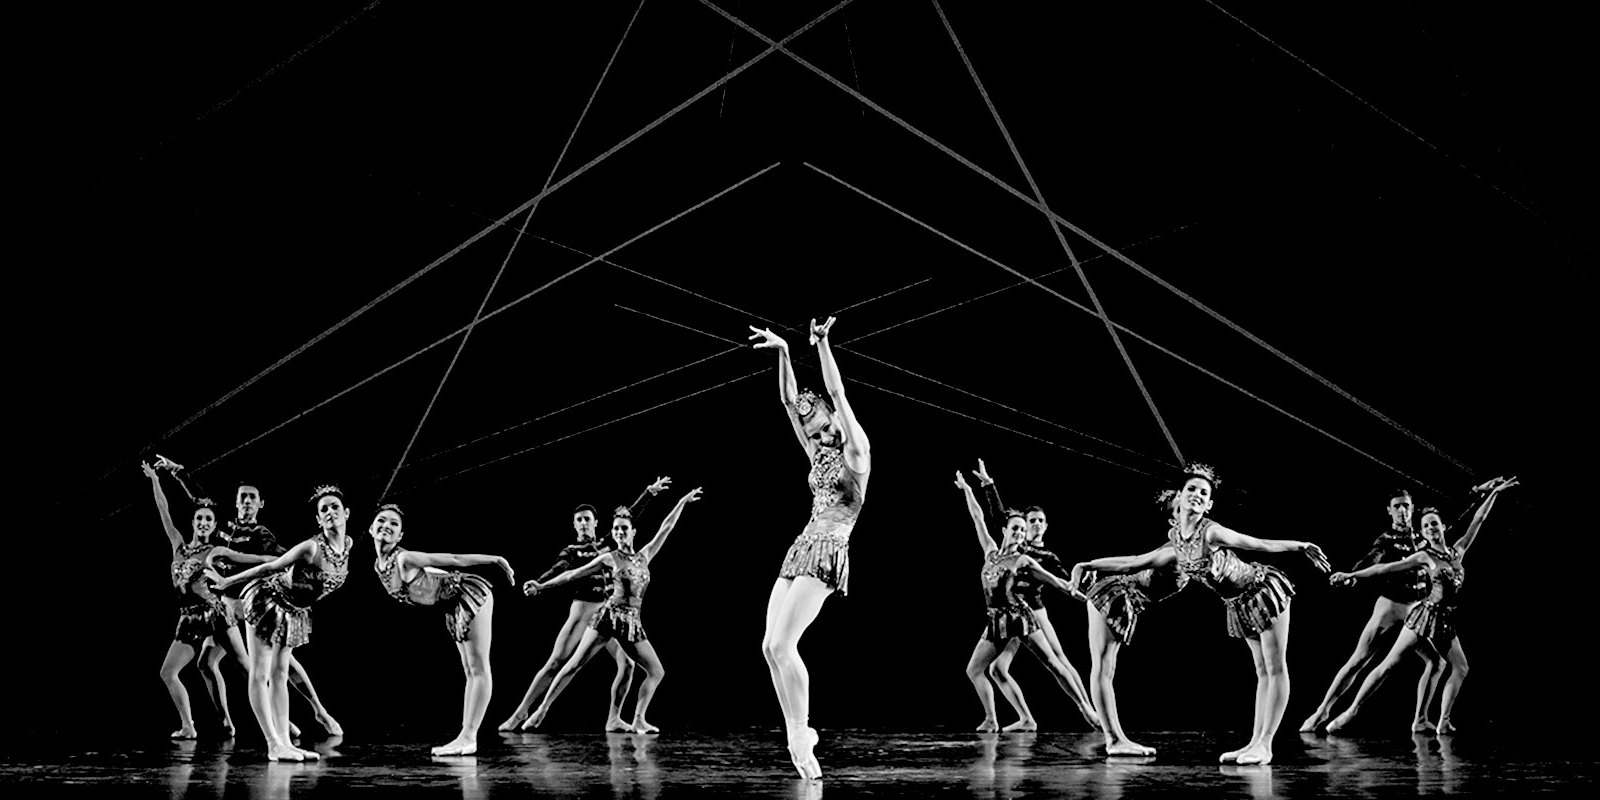 Ballett Weihnachten 2019.Staatsballett Berlin